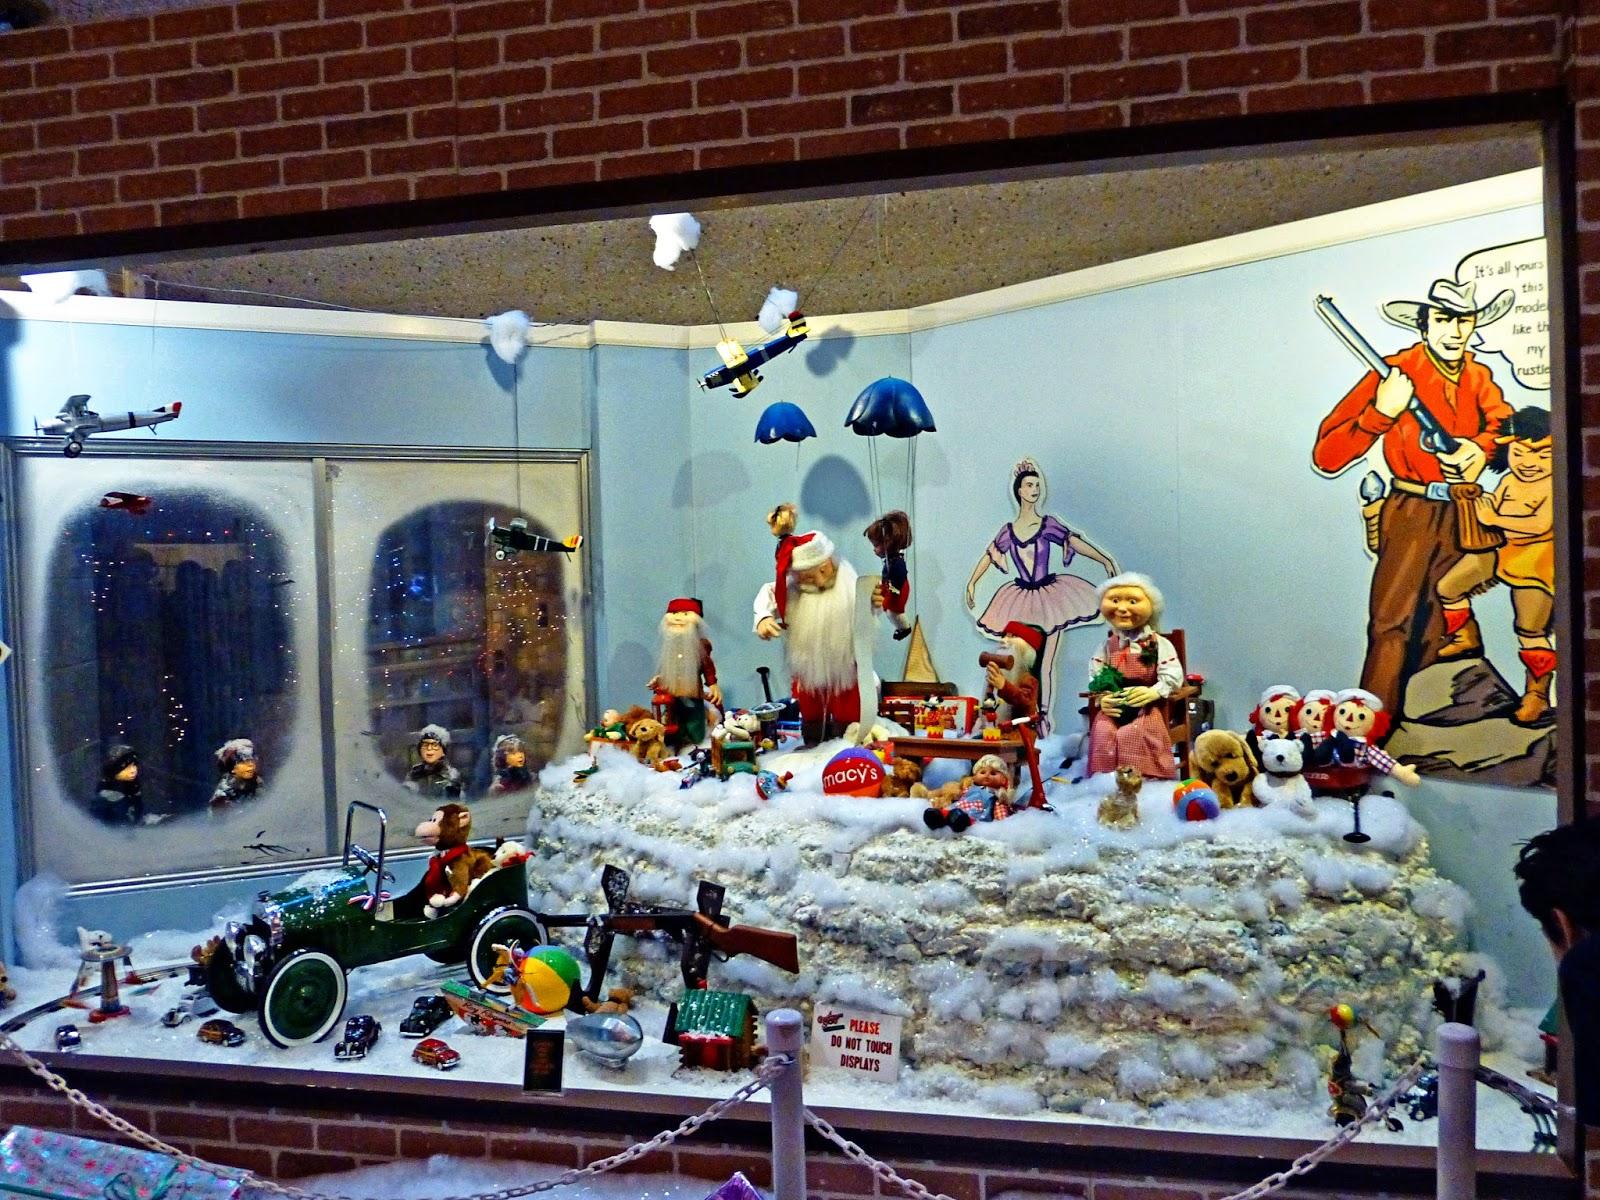 Theresa S Mixed Nuts Visiting A Christmas Story Window